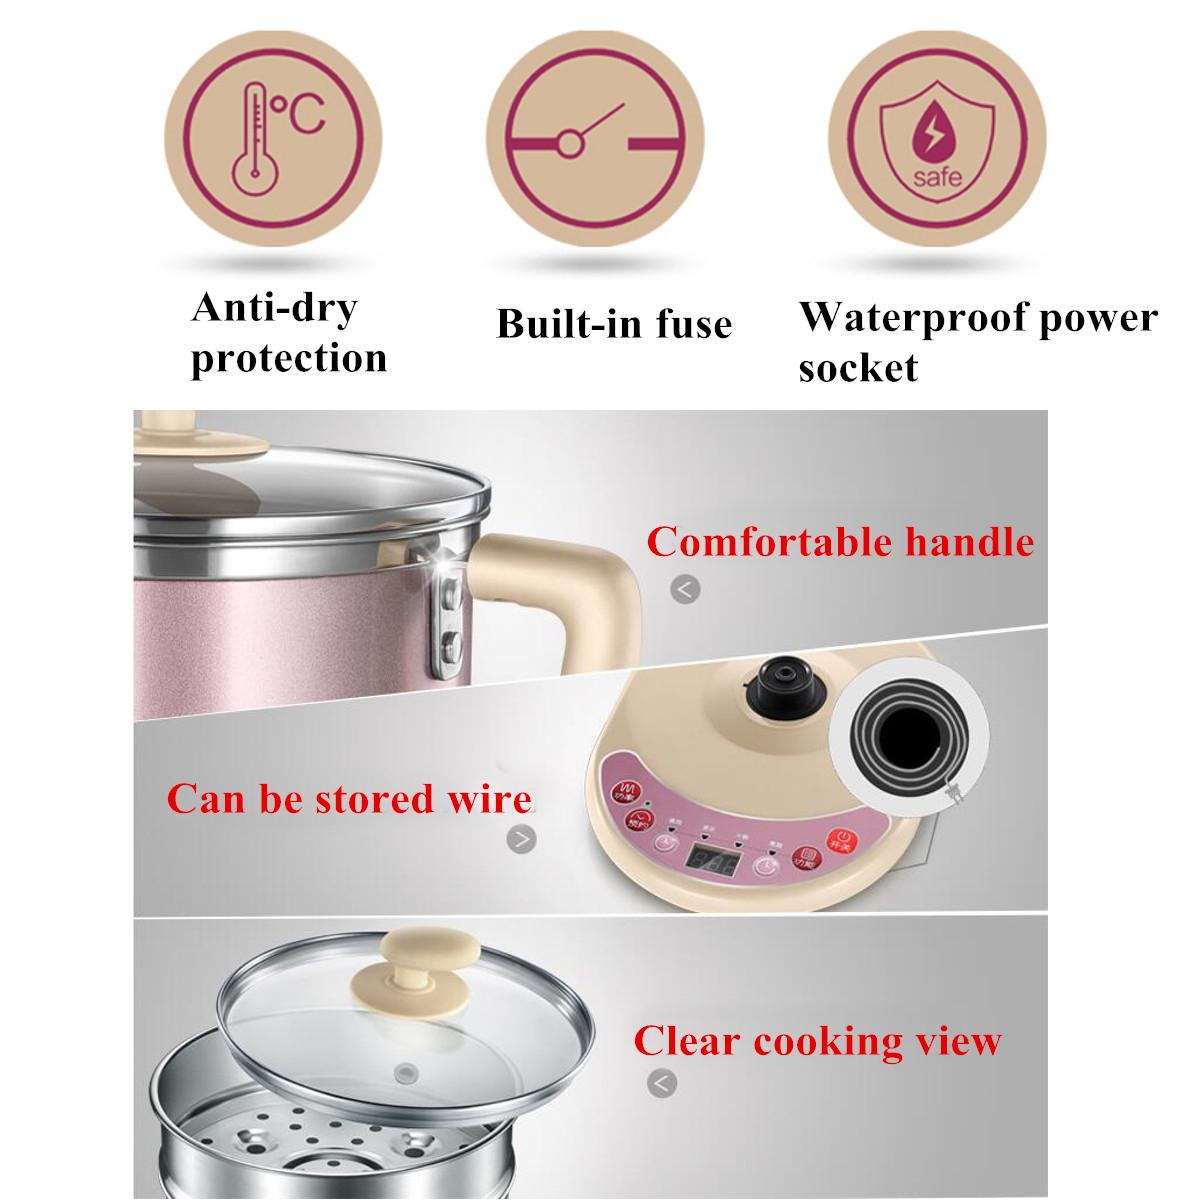 220V 600W Electric Boiler Skillet Automatic Hot Pot Cooker Steamer Kitchen Tool